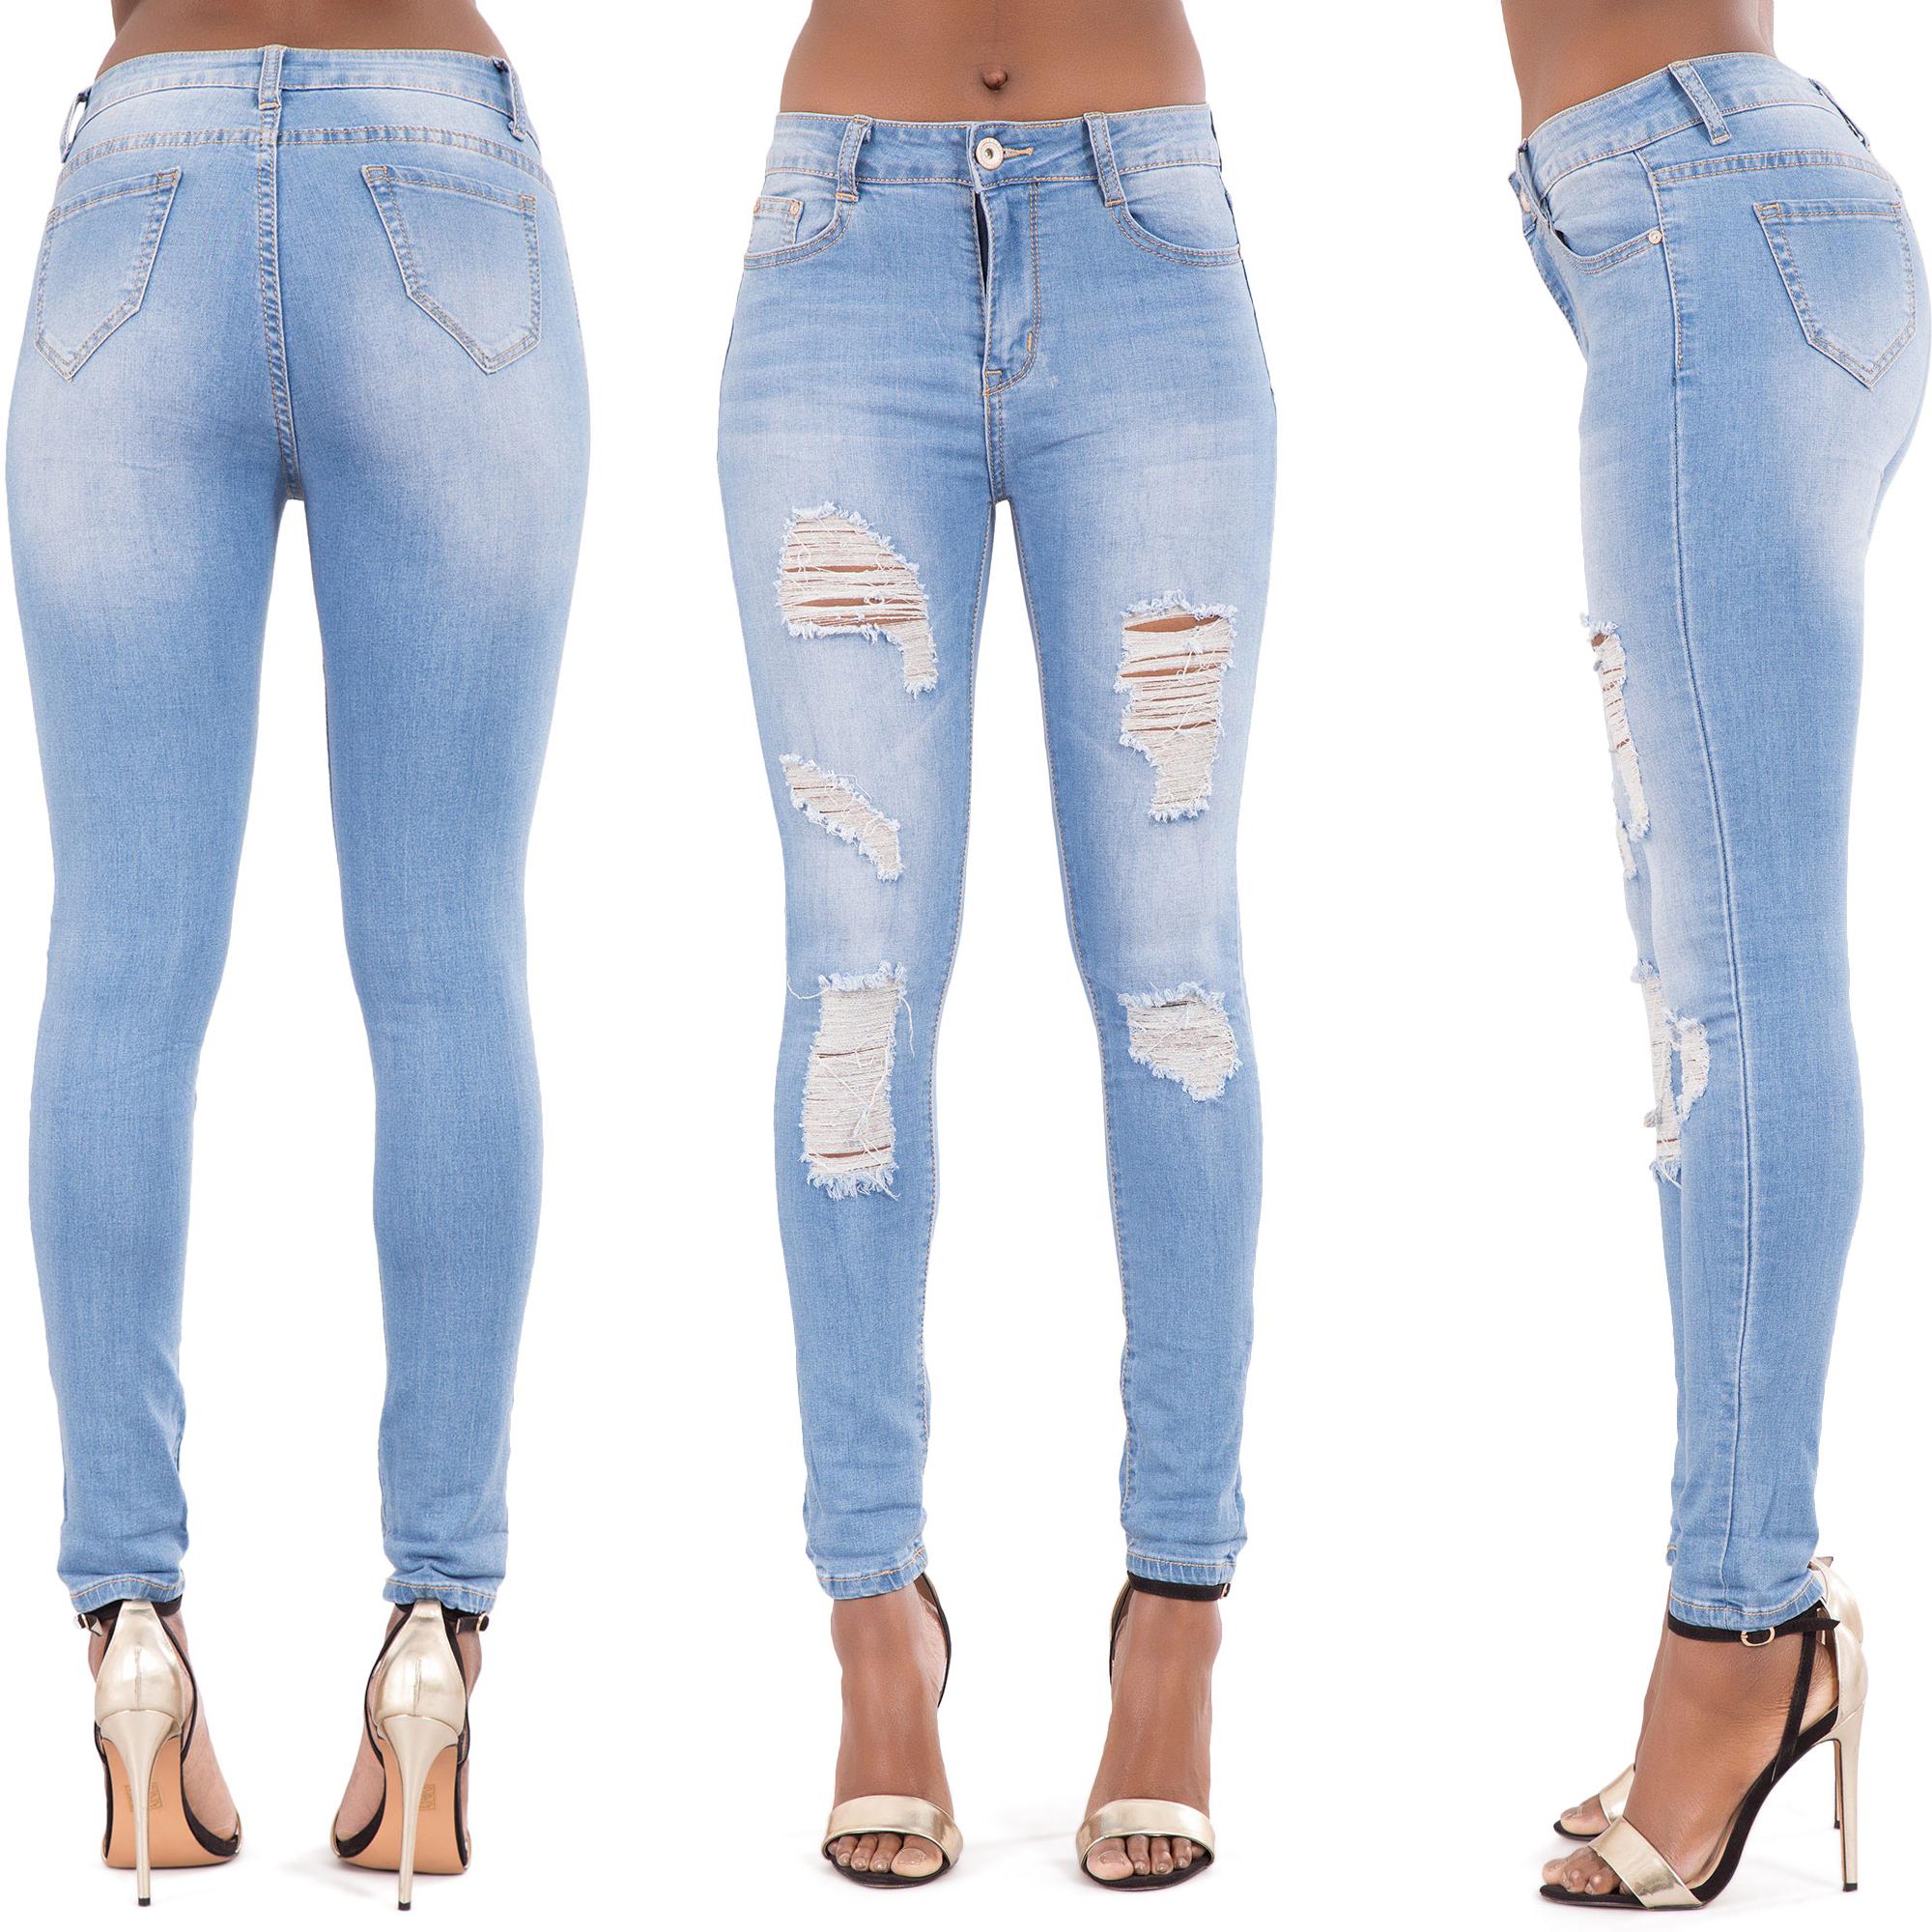 NEW-Ladies-Women-Blue-Black-Ripped-Skinny-Jeans-Slim-Fit-Stretch-Denim-Size-6-14